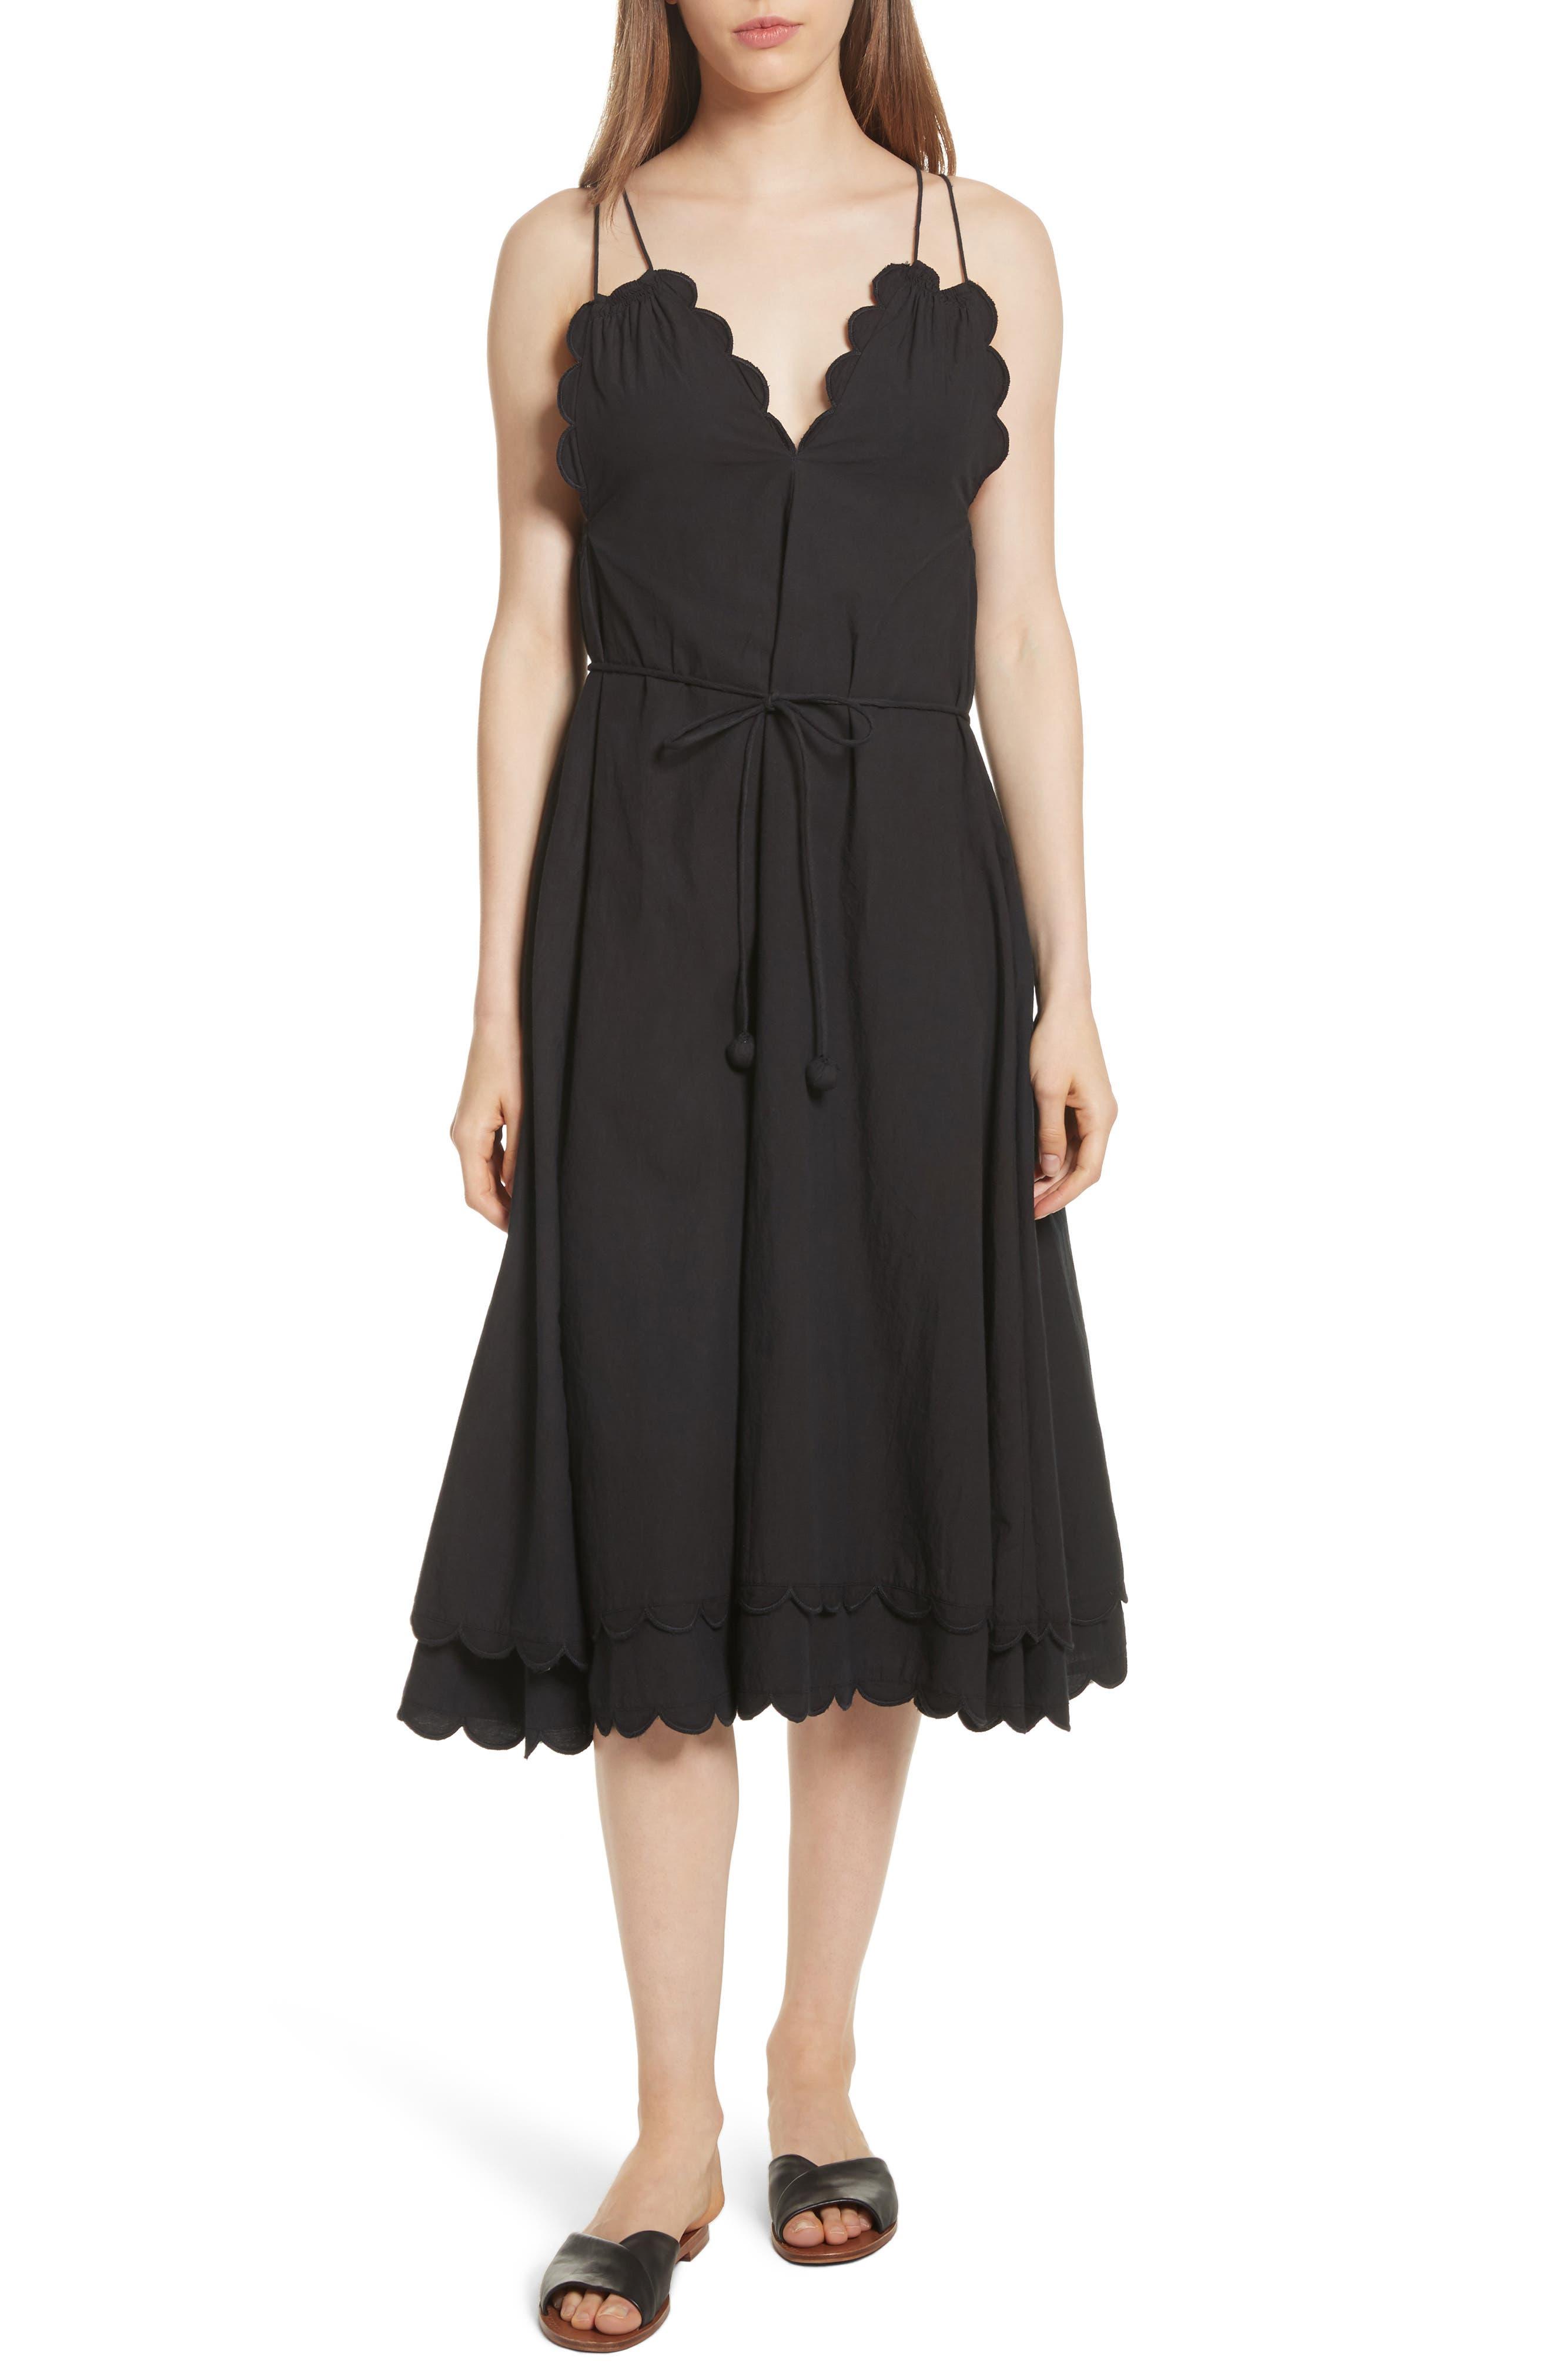 Apiece Apart Mirage Scallop Edge Dress